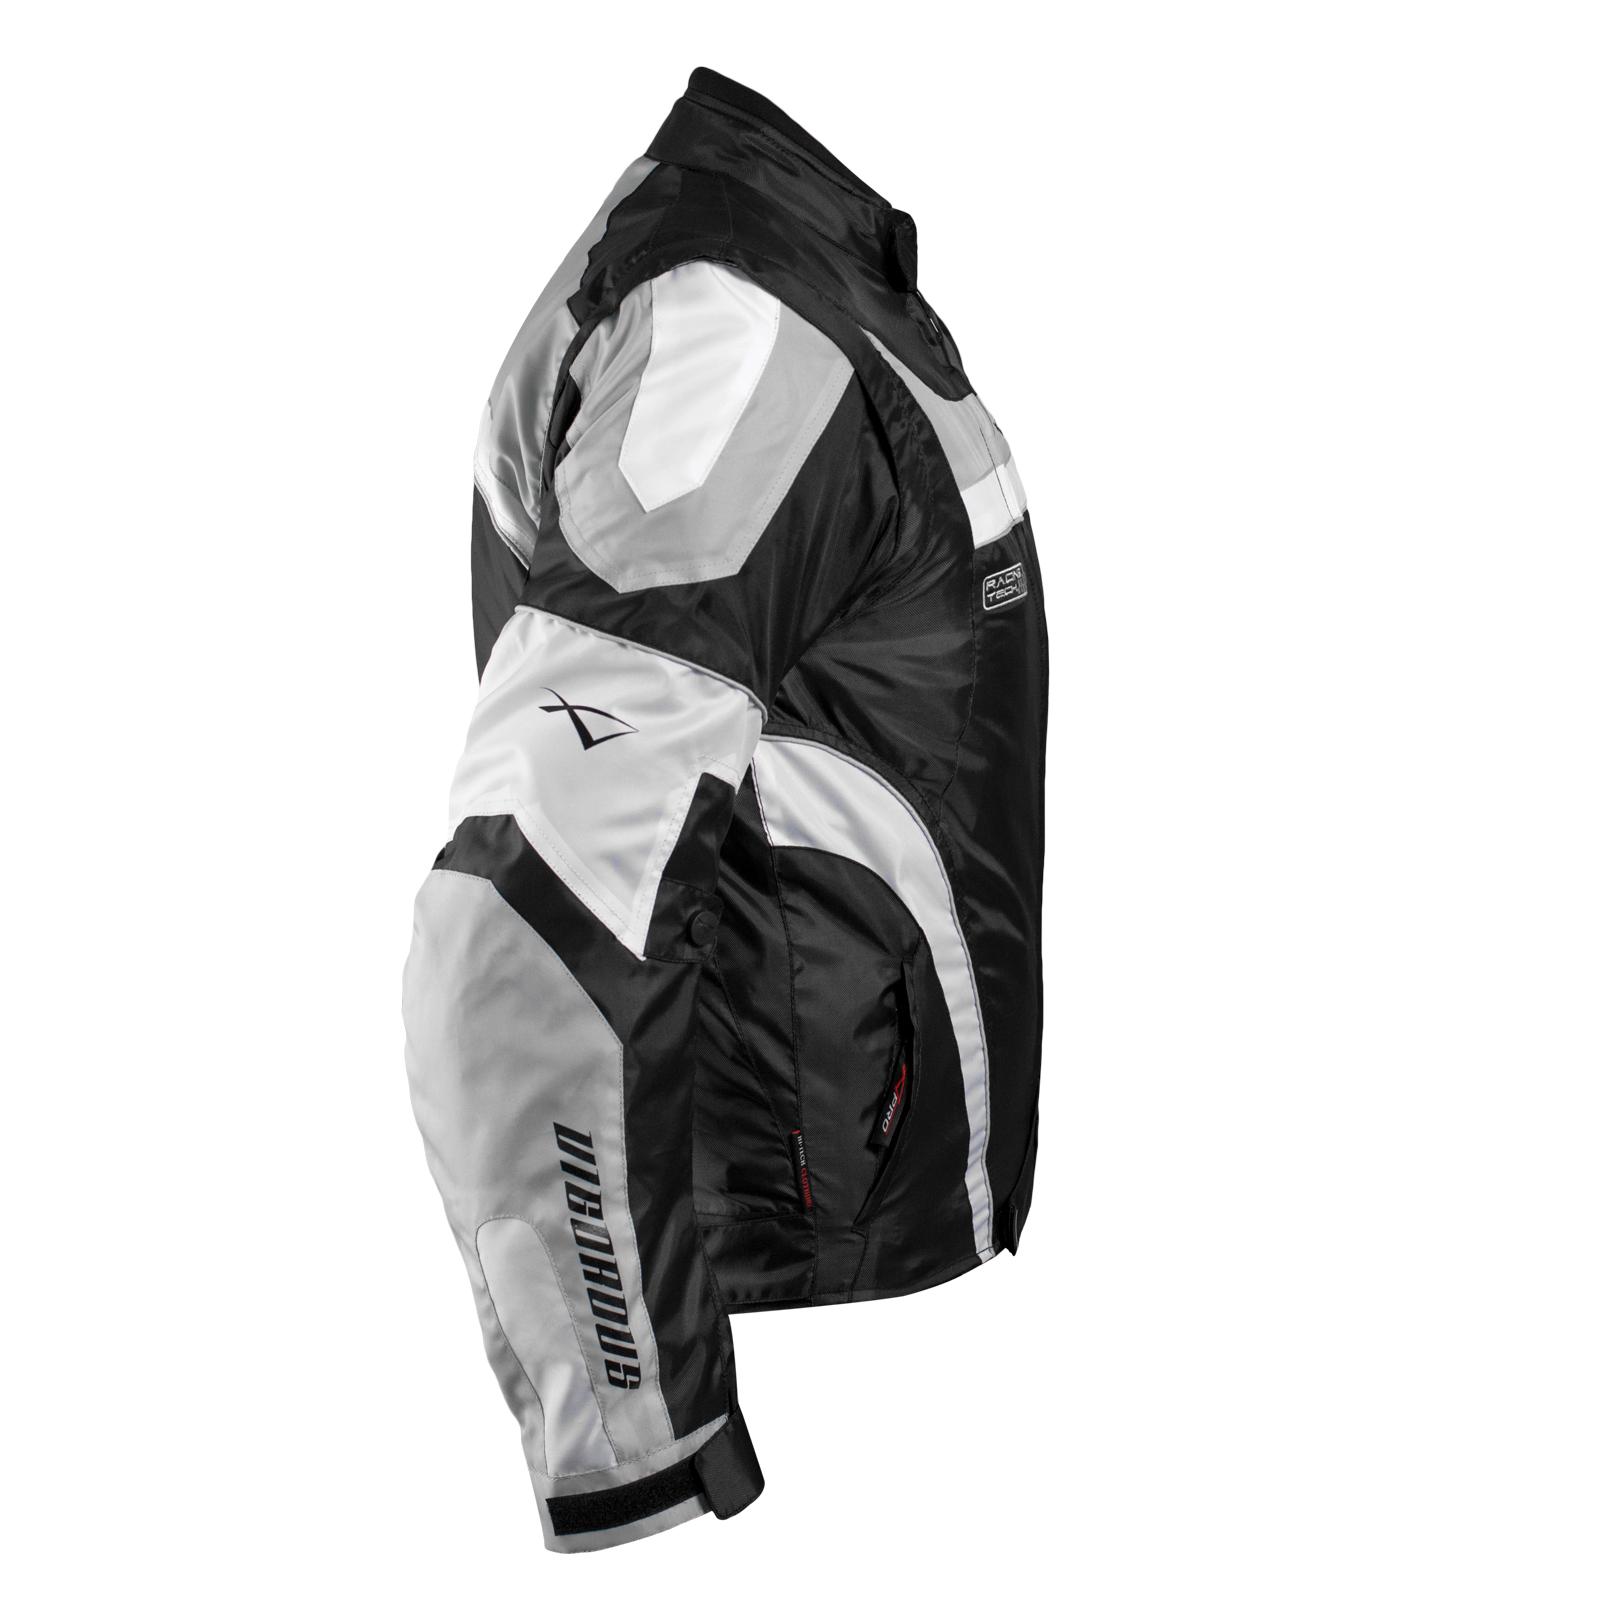 miniatuur 19 - Giacca Moto Manica Staccabile Tessuto Protezioni CE Sfoderabile Gilet Termico